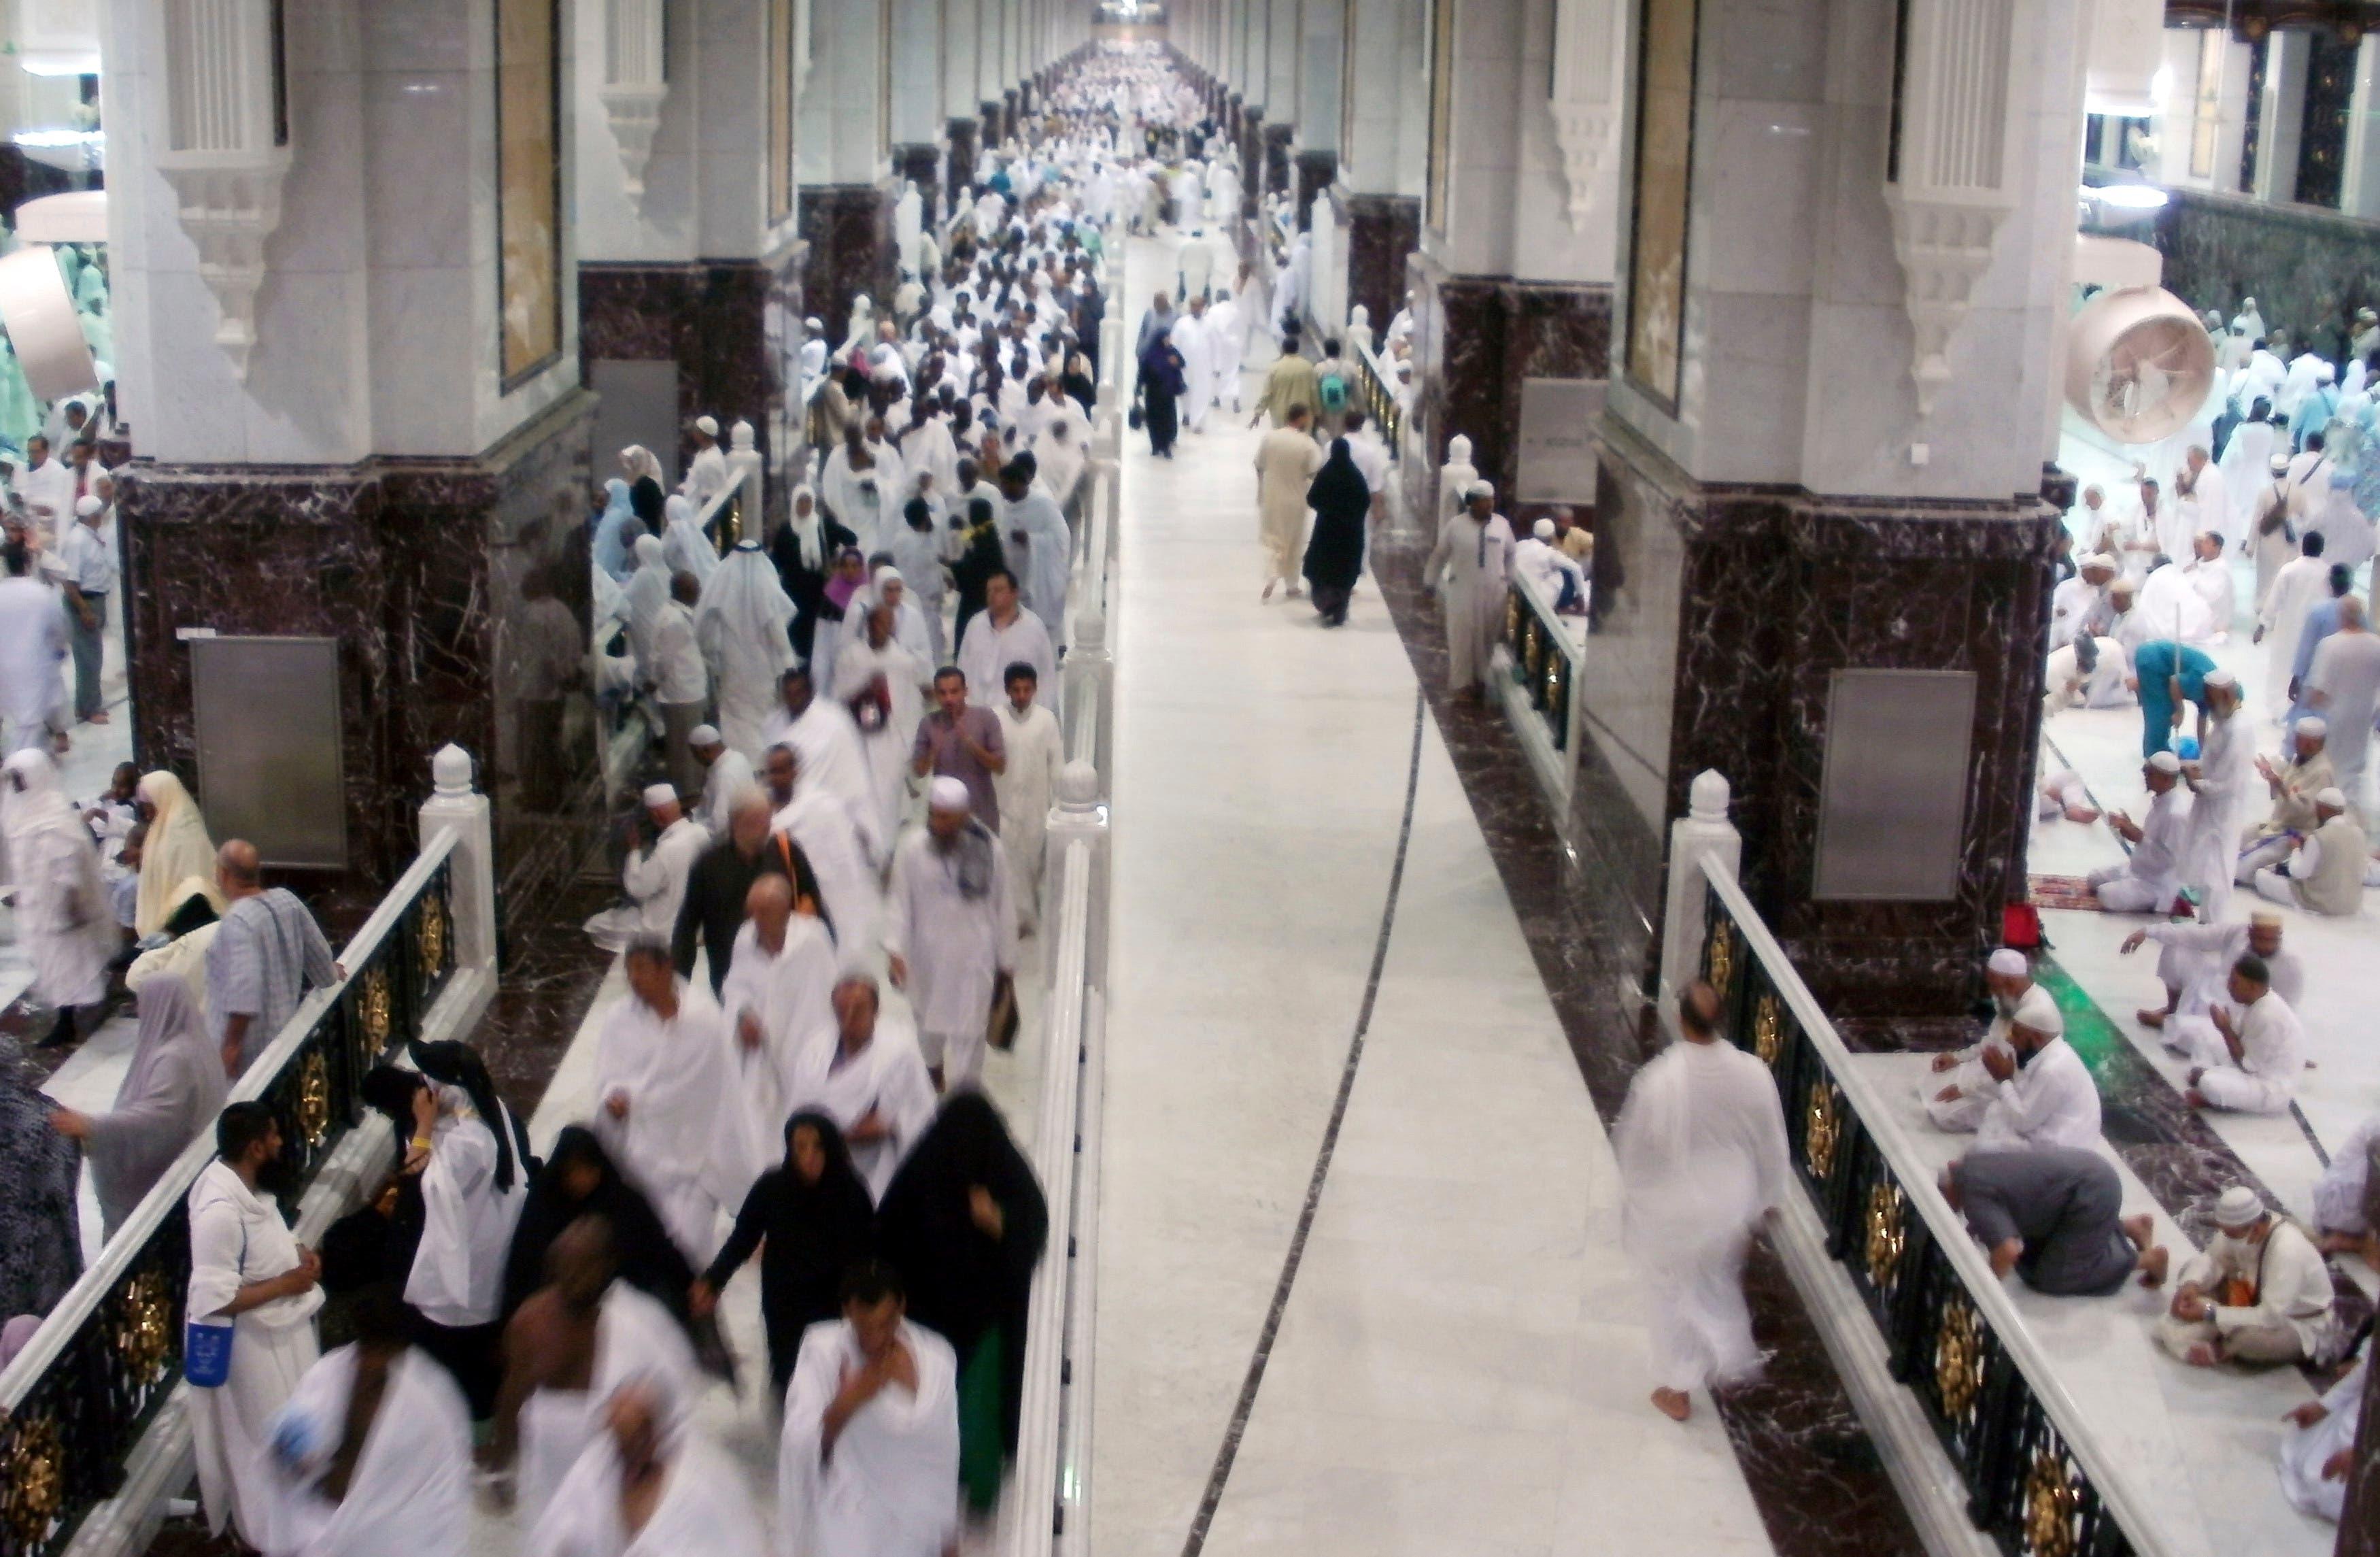 Muslim pilgrims walk at Al-Safa and Al-Marwah (Safa and Marwah) where Muslims walk back and forth seven times during the ritual pilgrimages of Haj and Umrah at the Grand Mosque, during the annual haj pilgrimage in Mecca October 17, 2012. (Reuters)